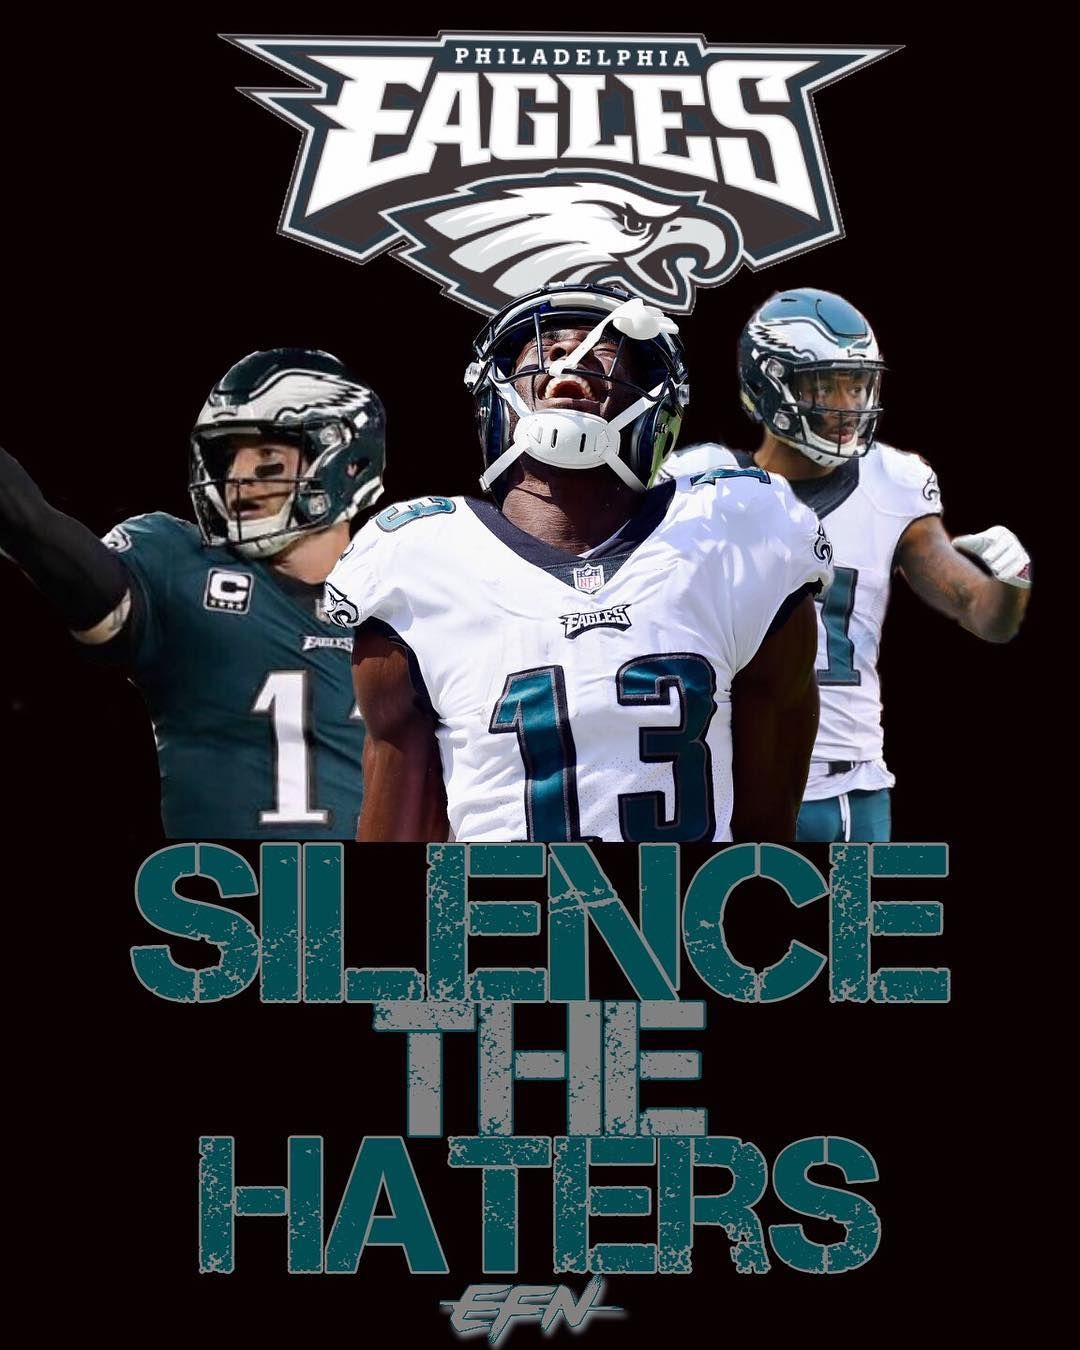 Super Bowl Champions!! Philadelphia eagles fans